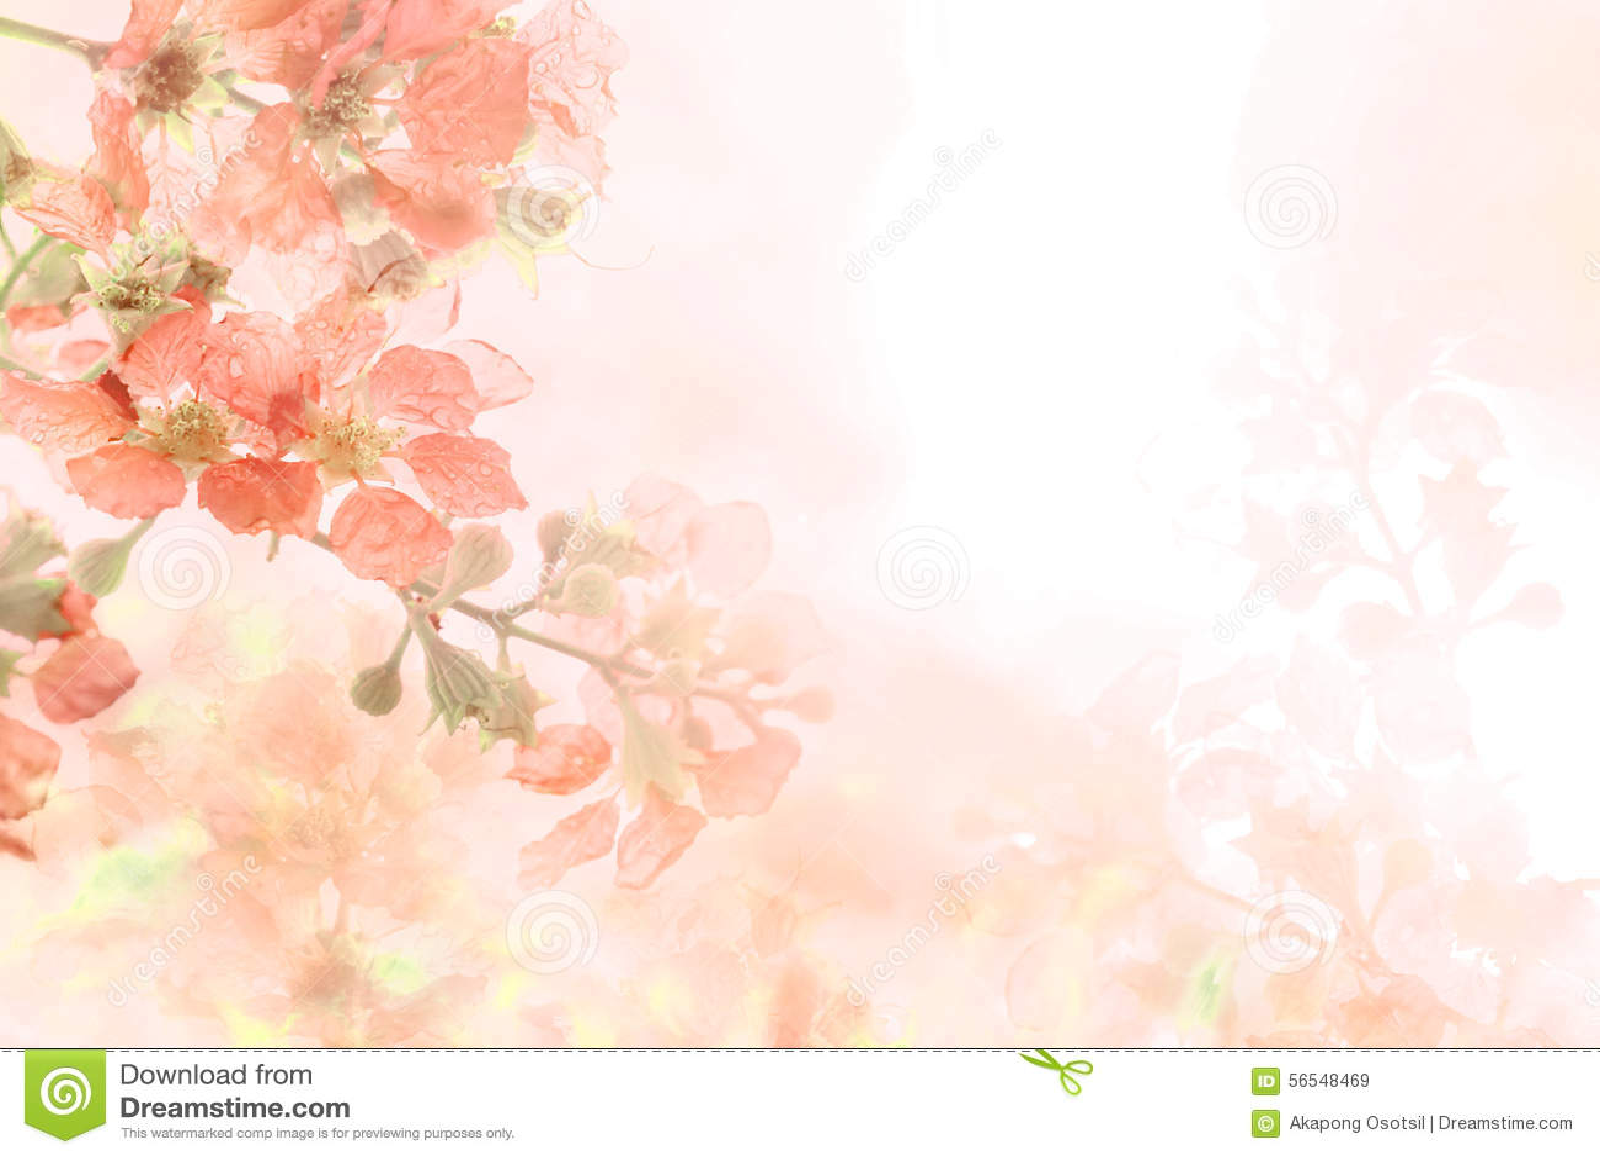 Abstract soft sweet orange flower background from Plumeria frangipani flowers